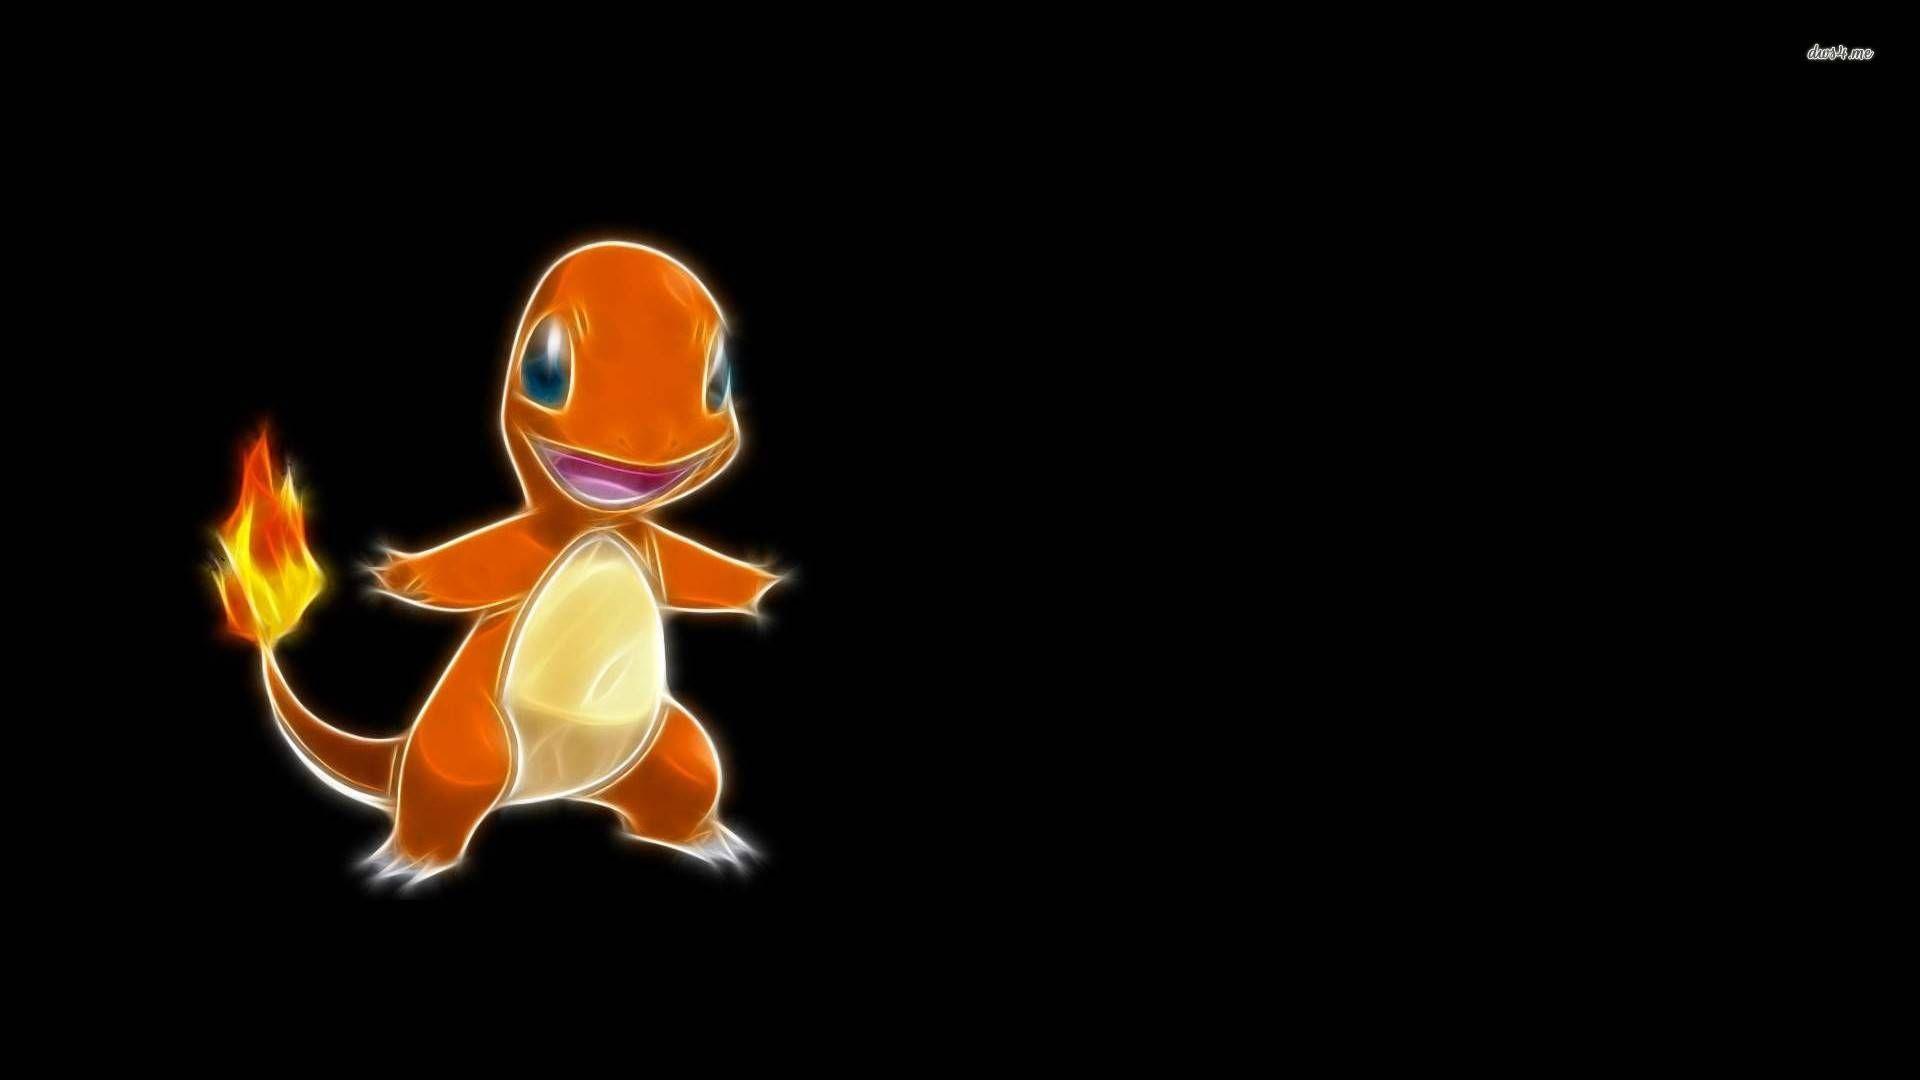 1920x1080 Pokemon Video Games Keep Calm And Charmander Wallpaper